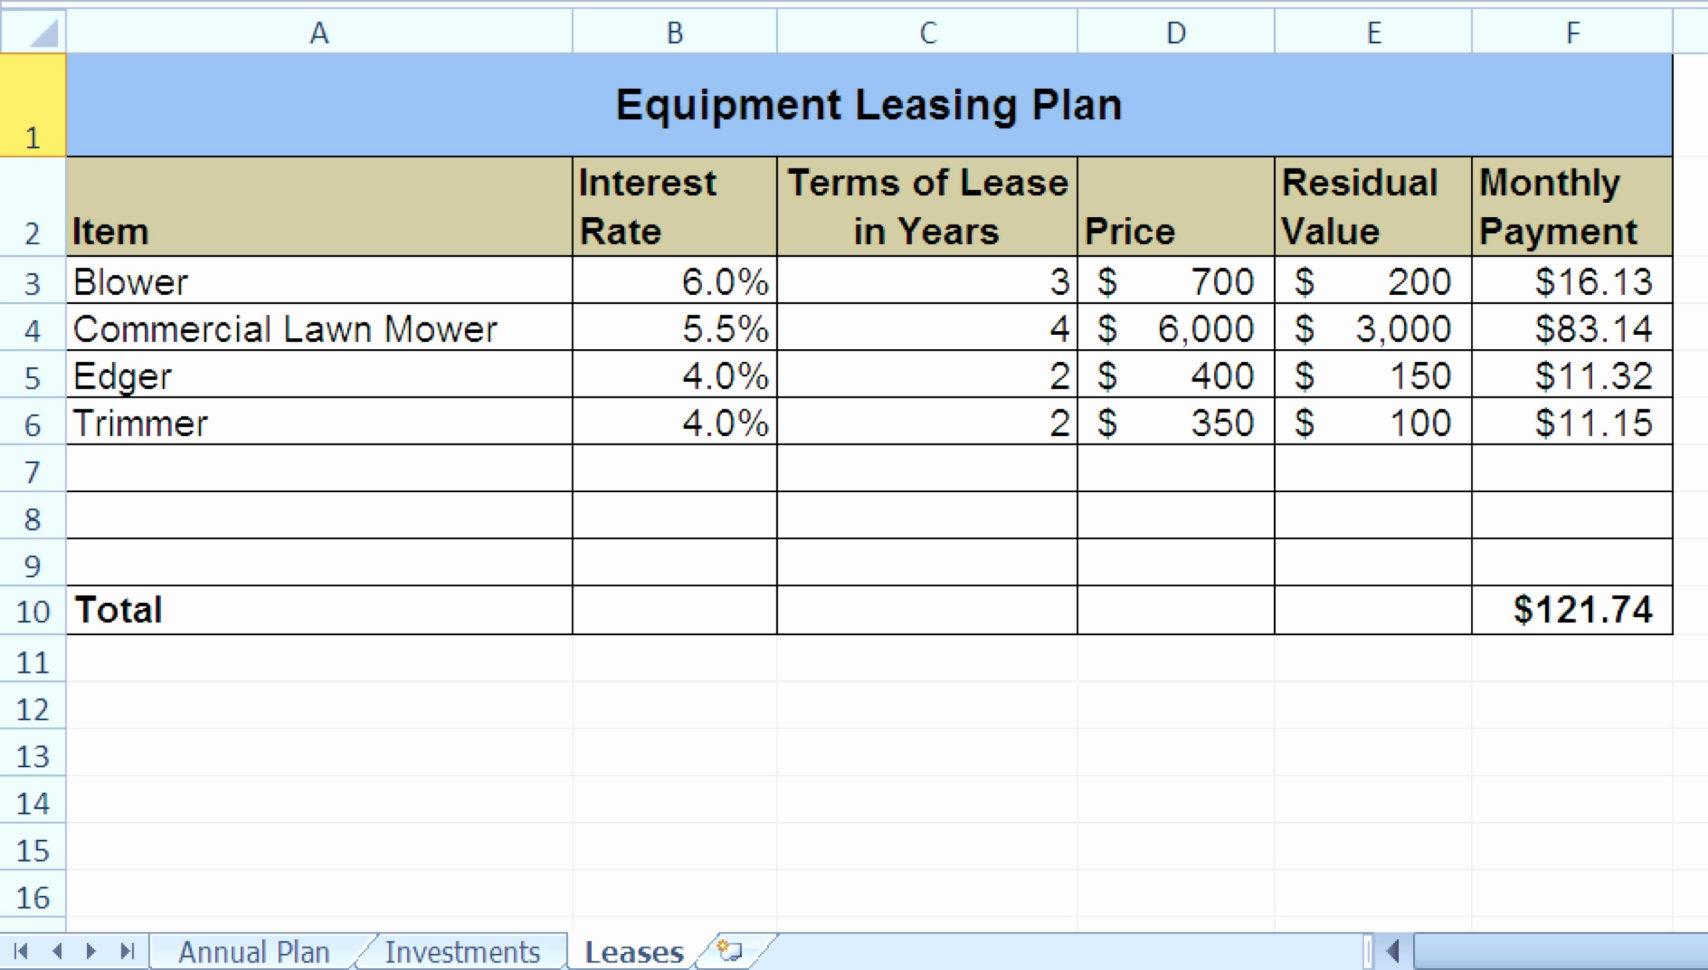 Novated Lease Calculator Excel Spreadsheet Pertaining To Equipment Lease Calculatorl Spreadsheet Car V Buy Ozil Almanoof On